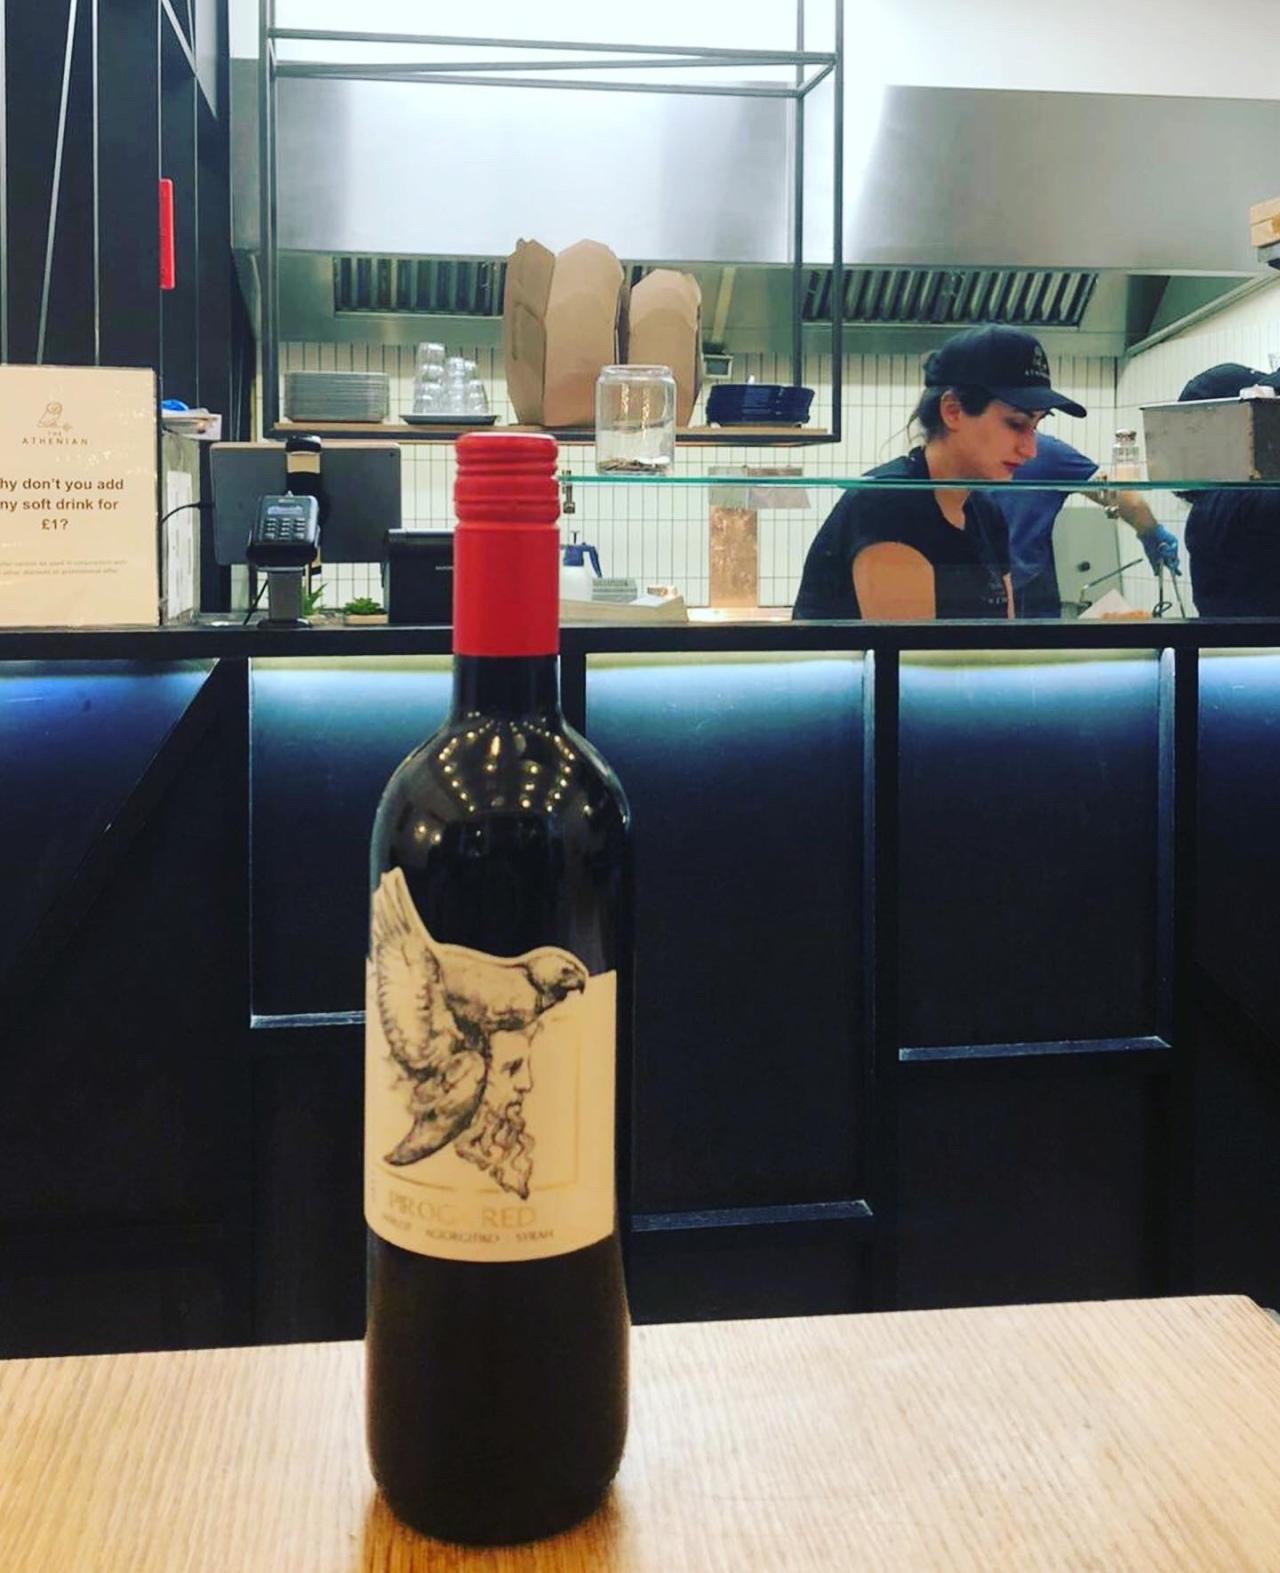 The Athenian Greek red wine